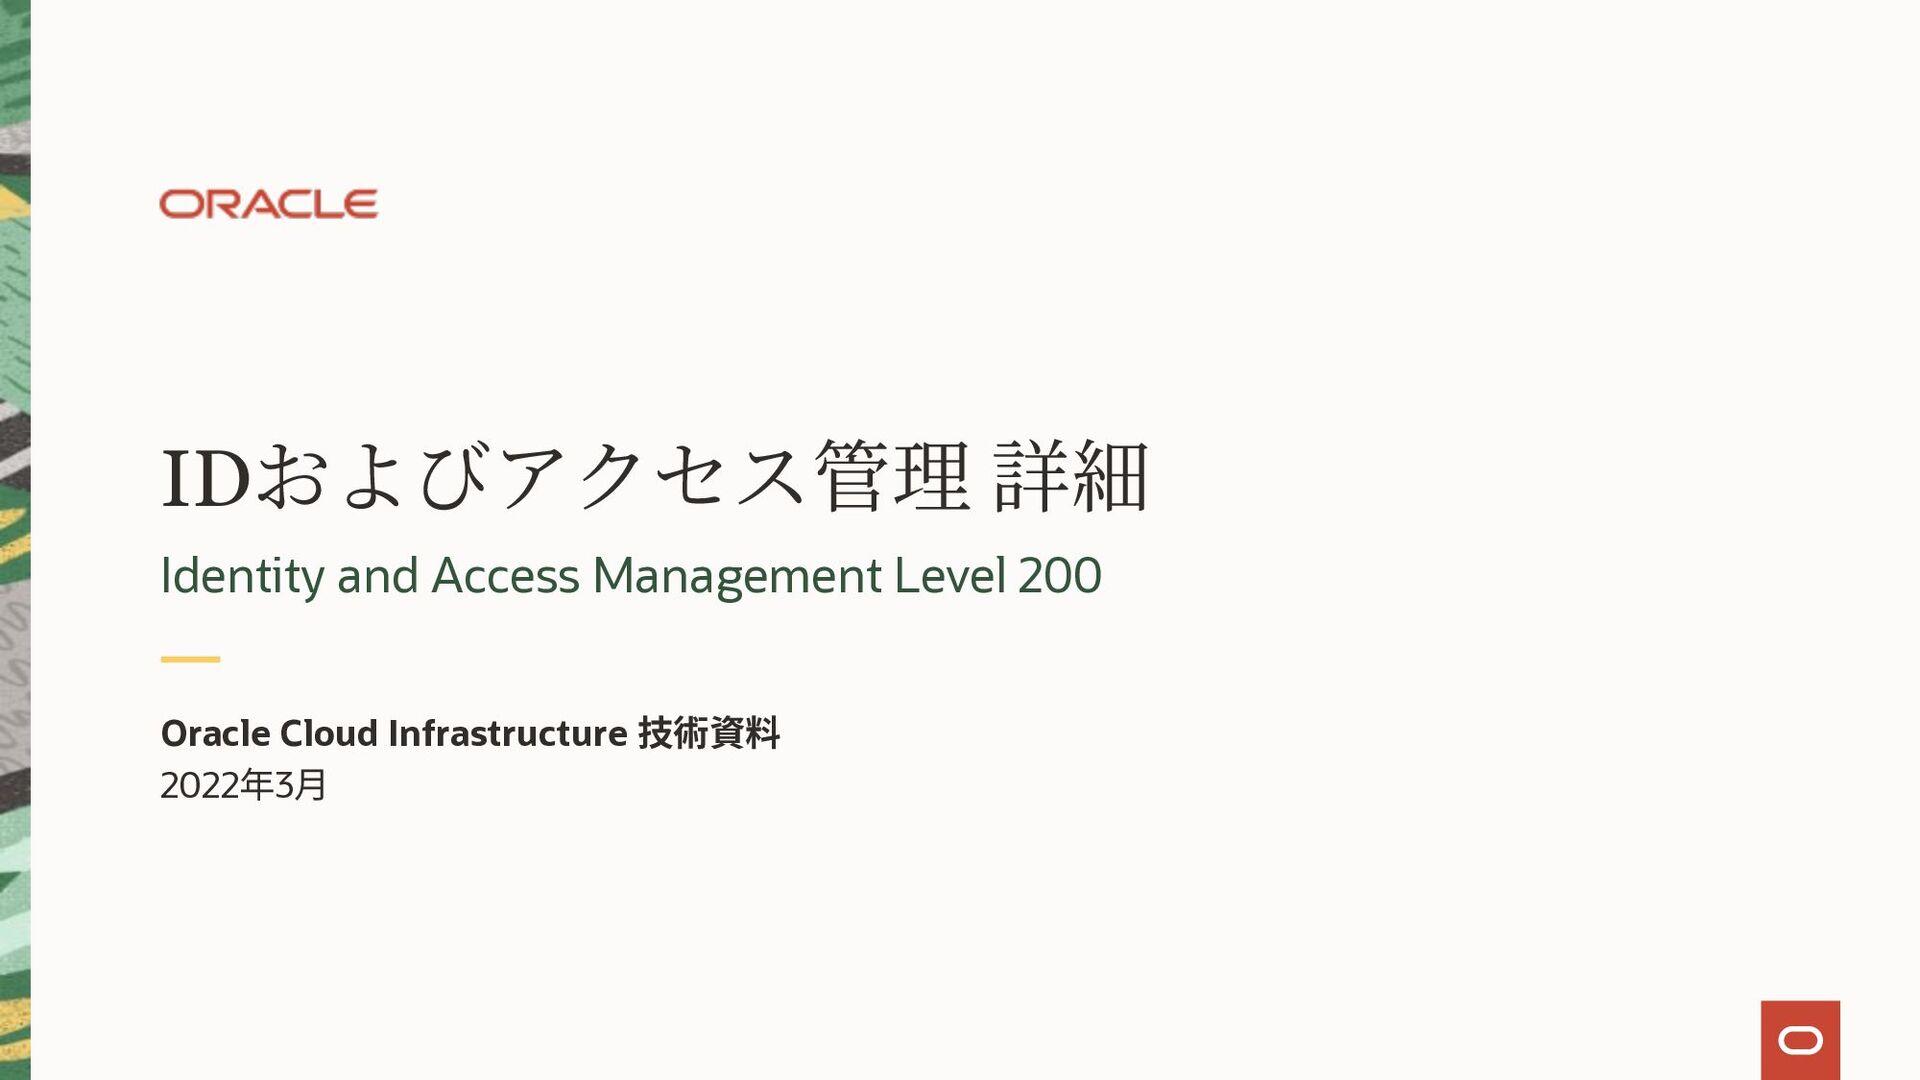 IDおよびアクセス管理 詳細 Identity and Access Management L...